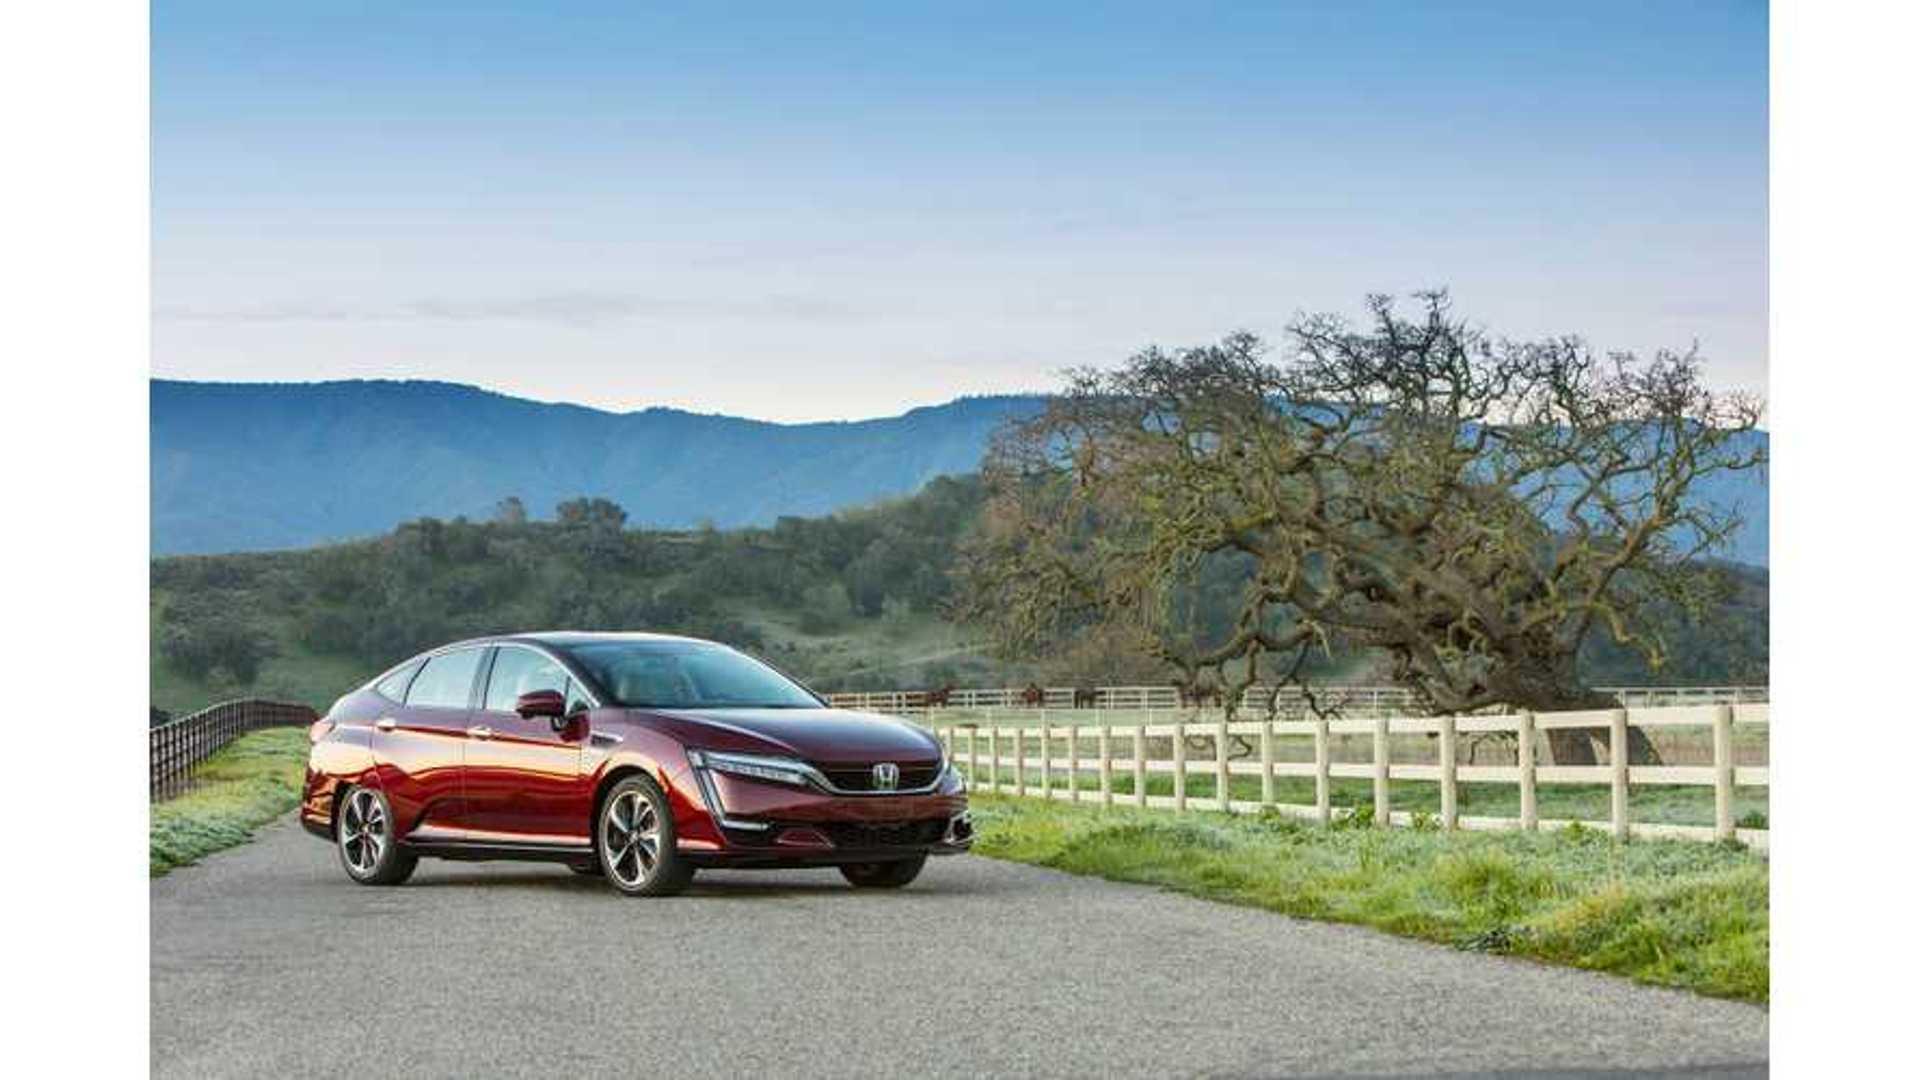 Honda Confident Fuel Cell Vehicles Will Go Mainstream: No Timeline